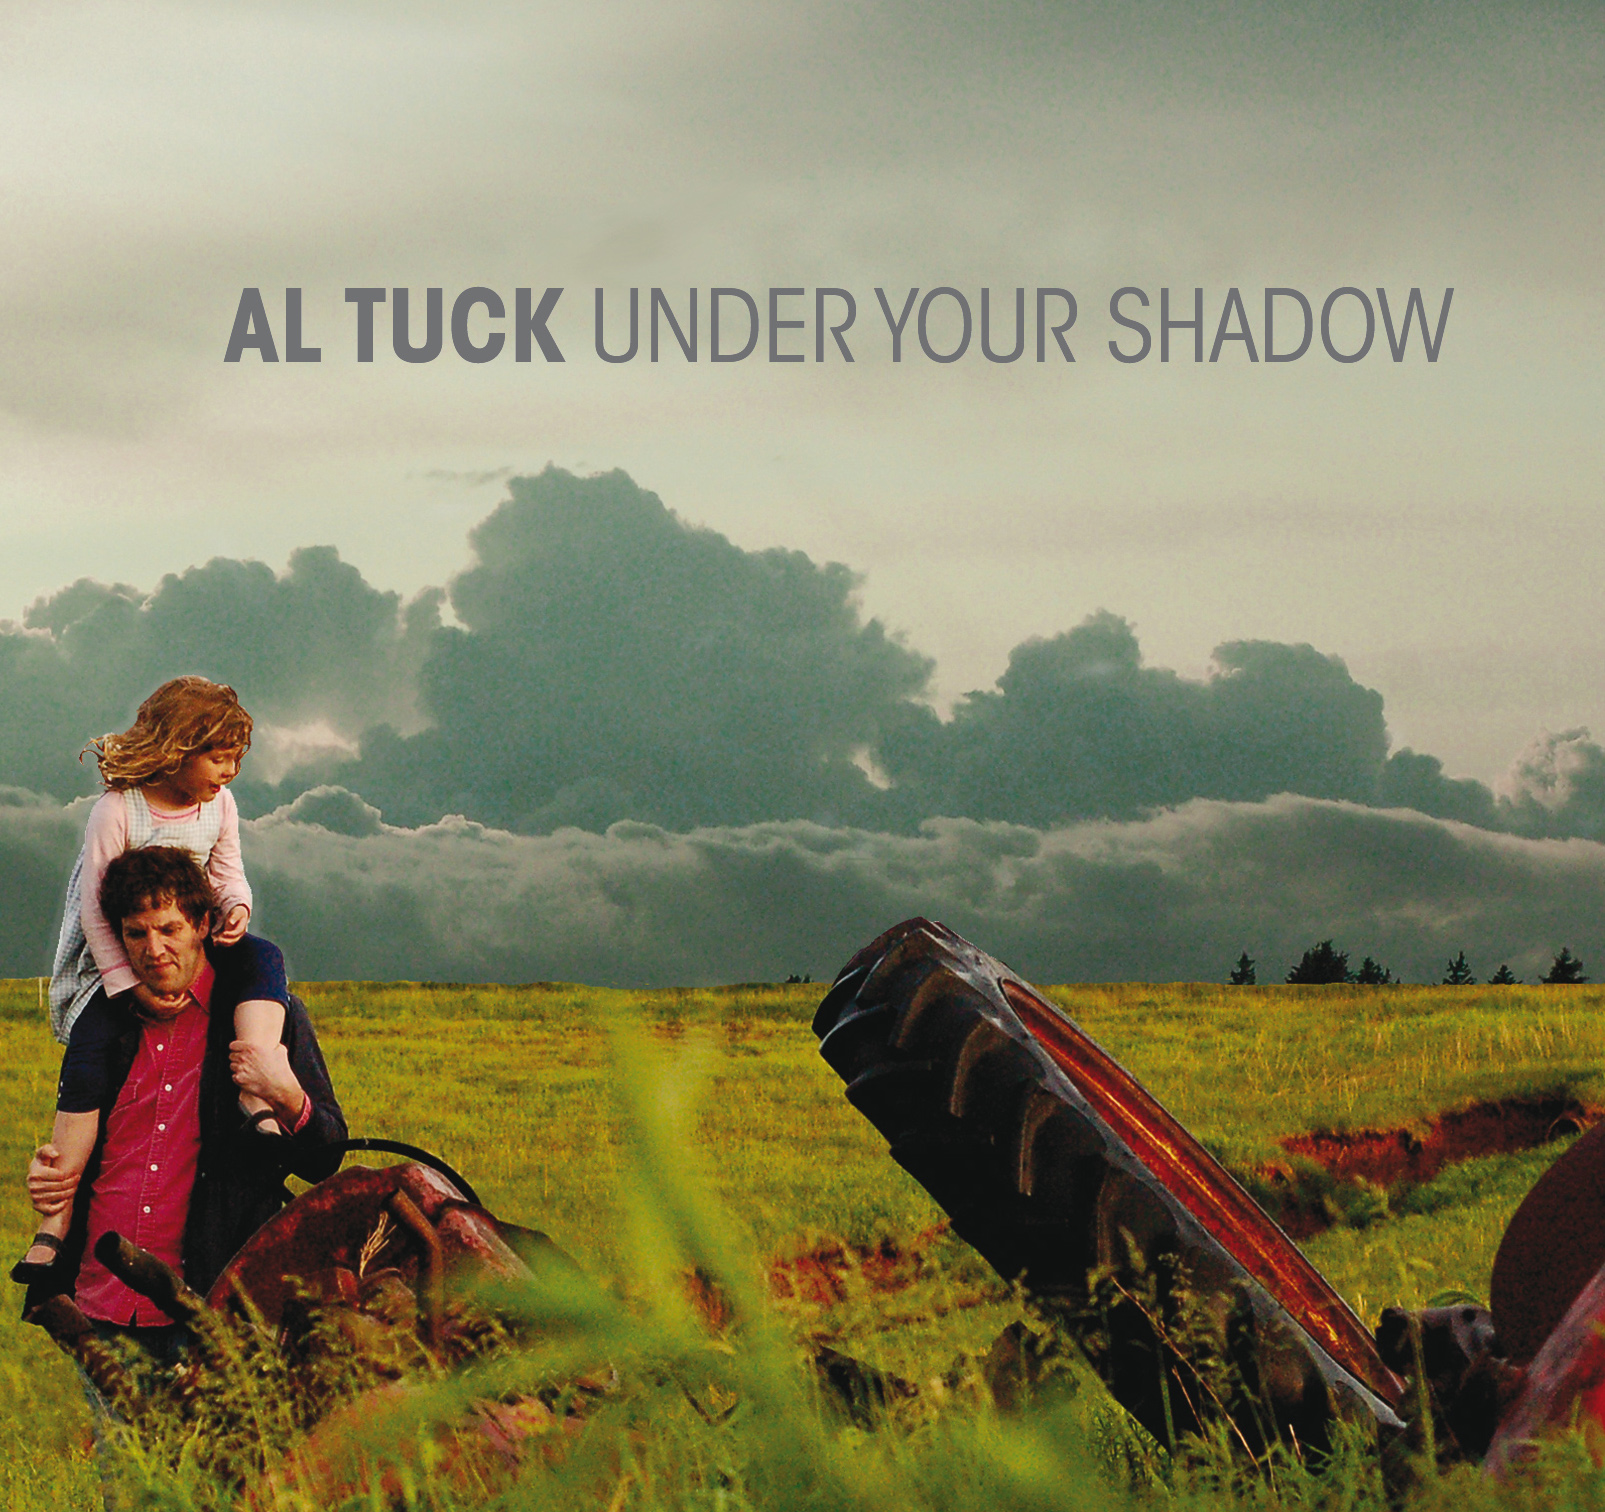 altuck_under_your_shadow.jpg